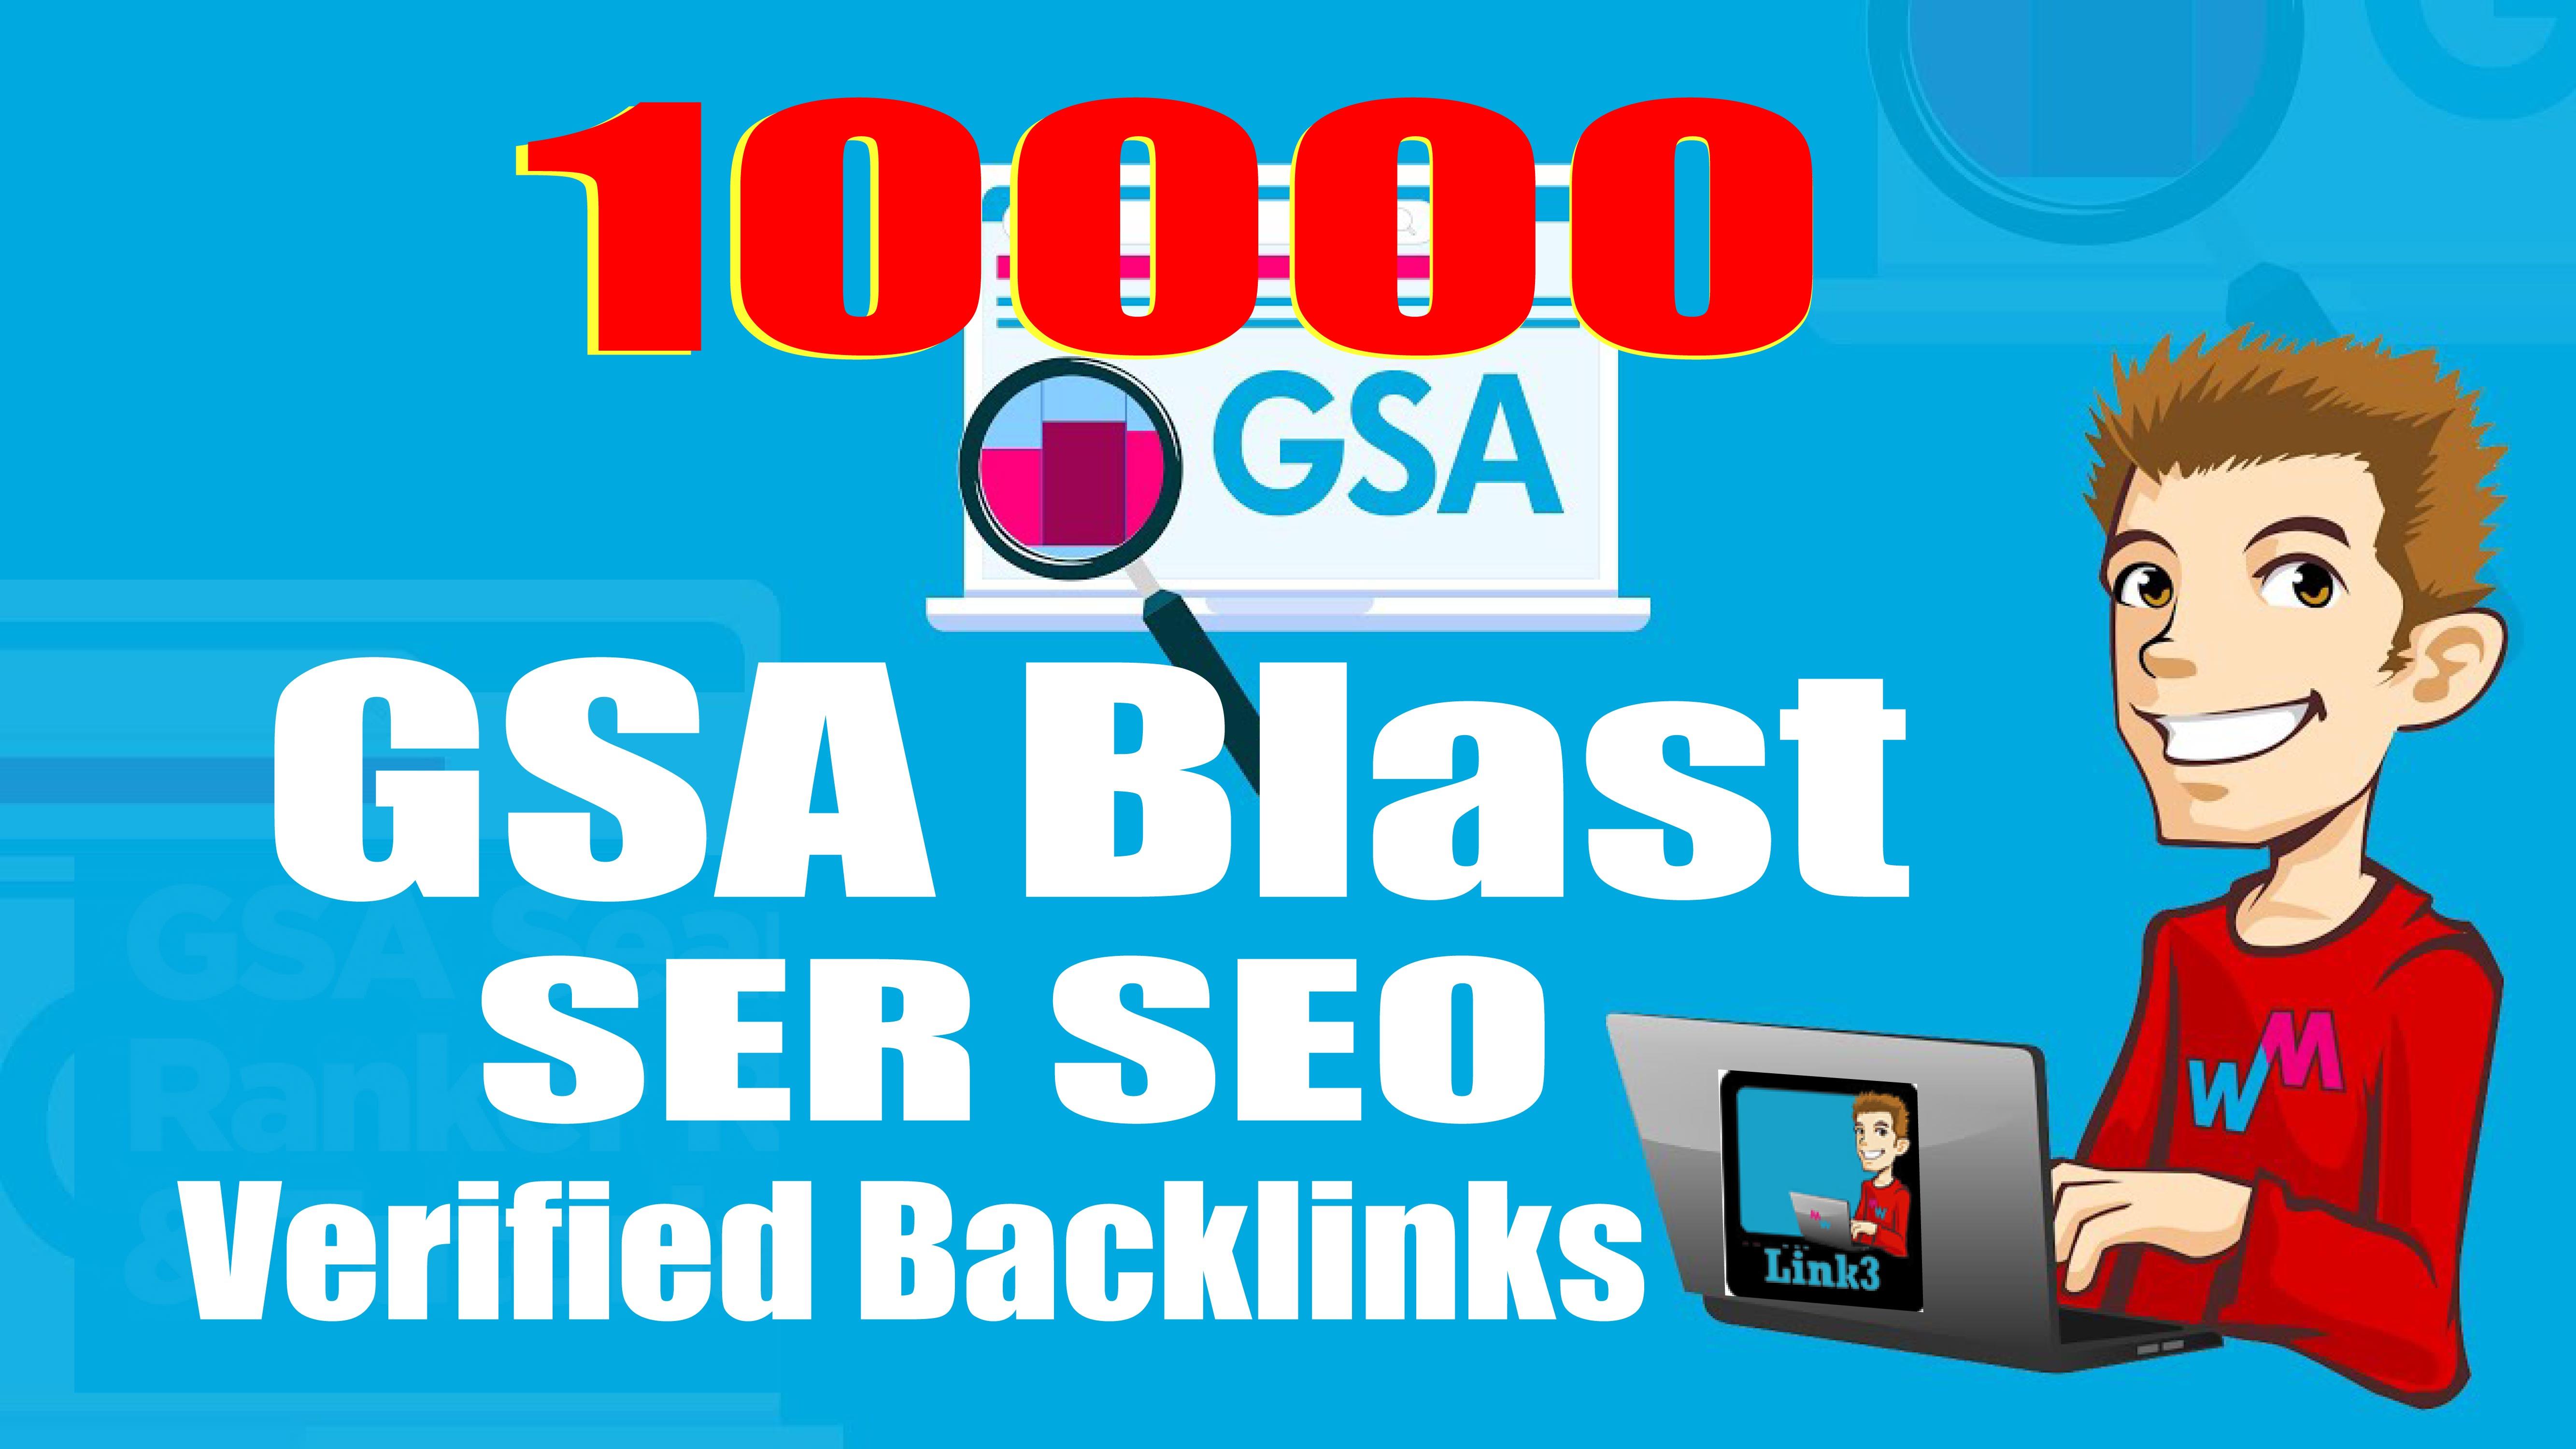 GSA Blast GSA SER To Create 10,000 Verified Backlinks